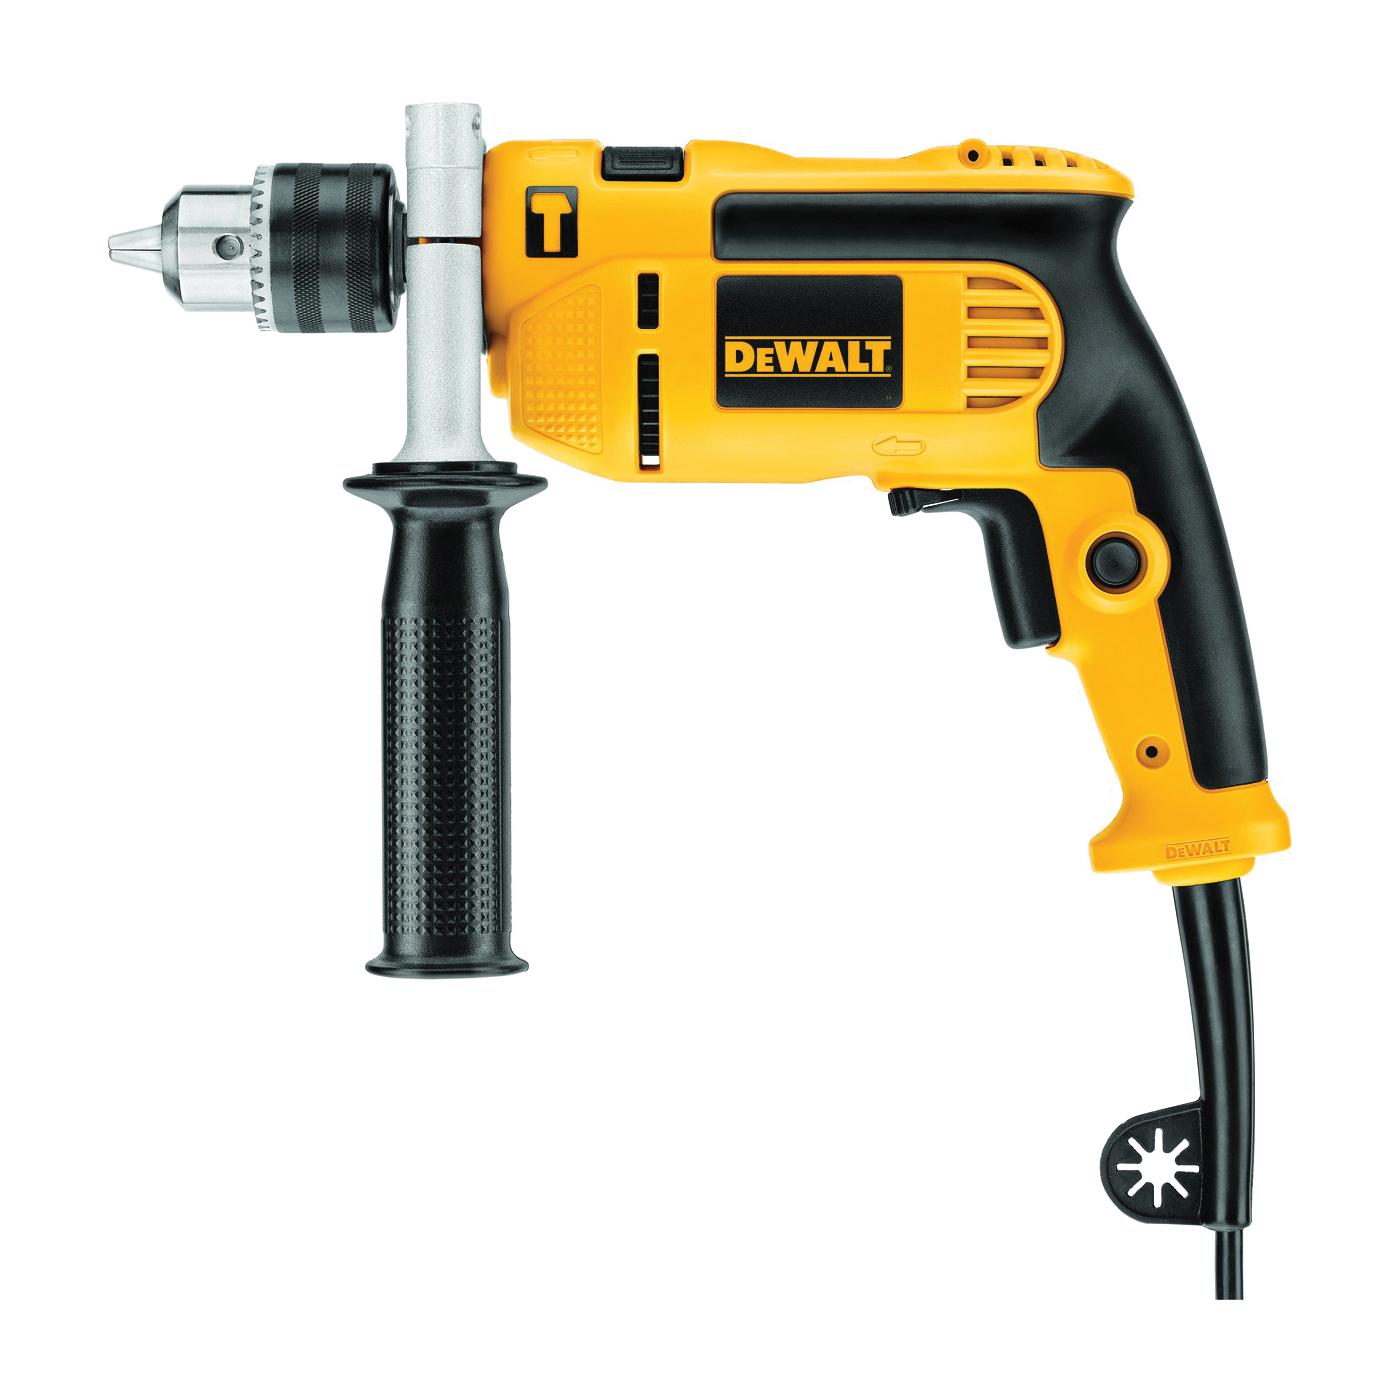 Picture of DeWALT DWE5010 Hammer Drill, 7 A, 550 W, 1-1/4 in Wood, 1/2 in Steel Drilling, 1/2 in Chuck, Keyed Chuck